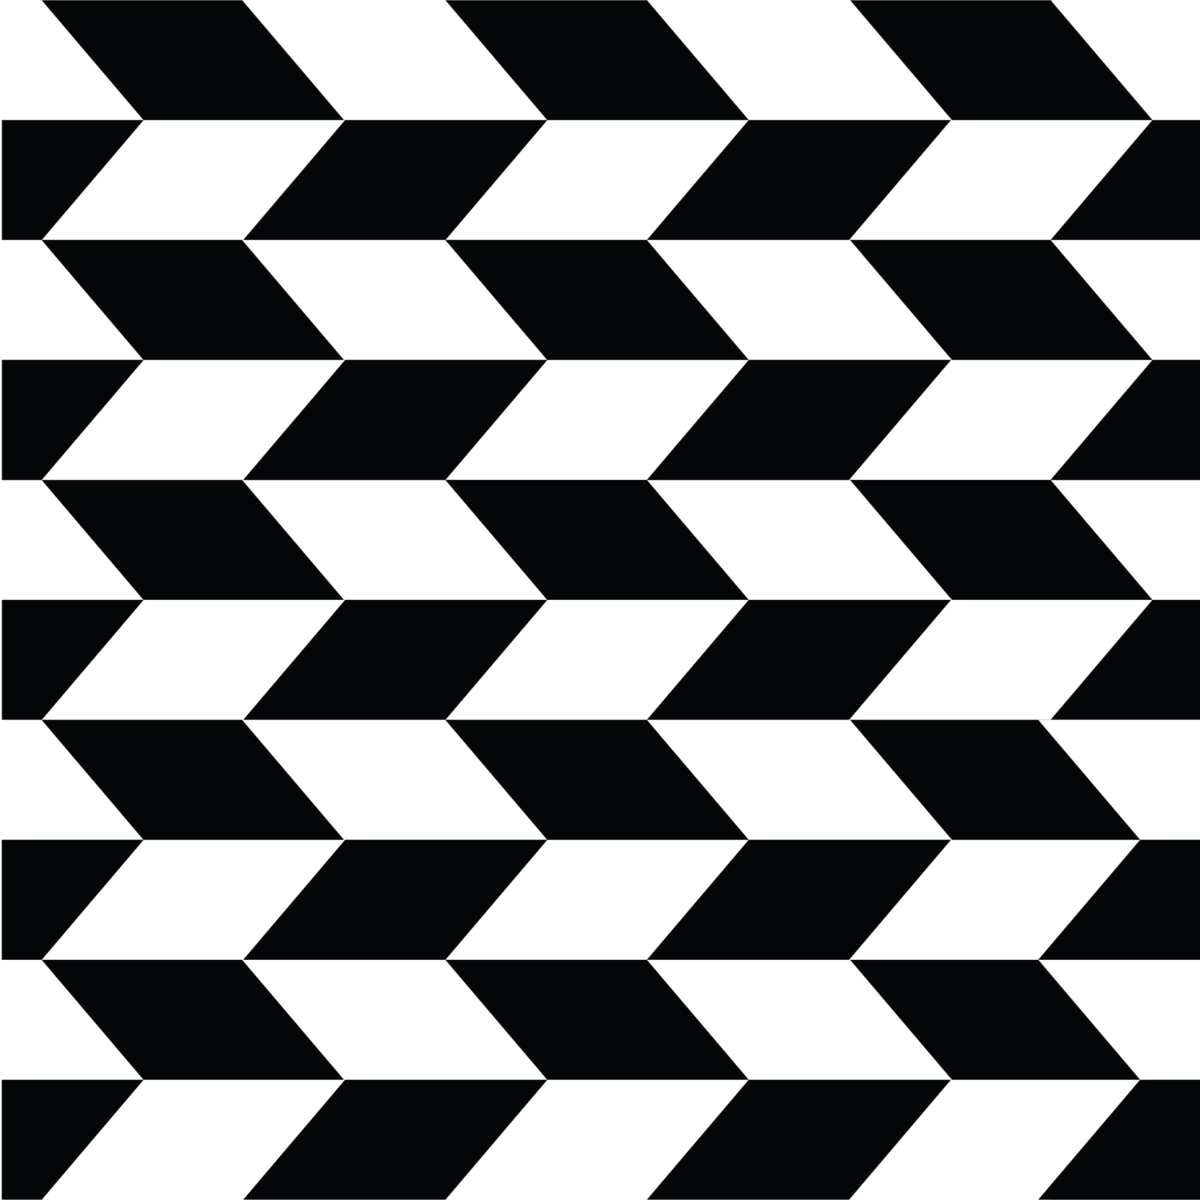 MV Picasso La Vie 200x200mm_Stiles_Product_Image